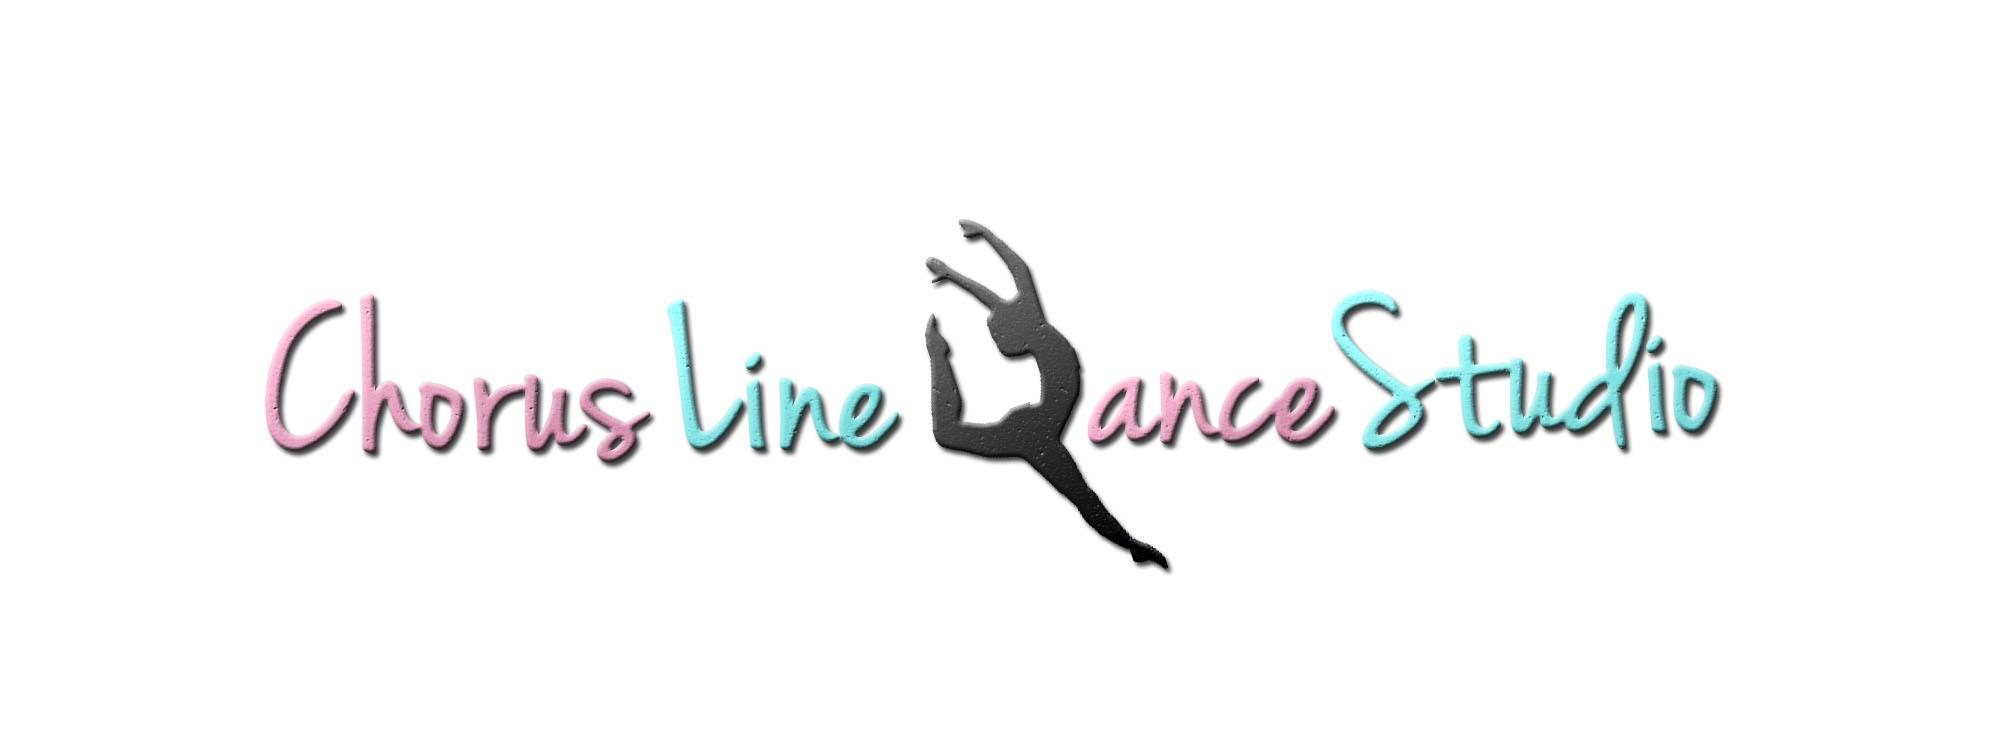 Chorus Line Dance Studio